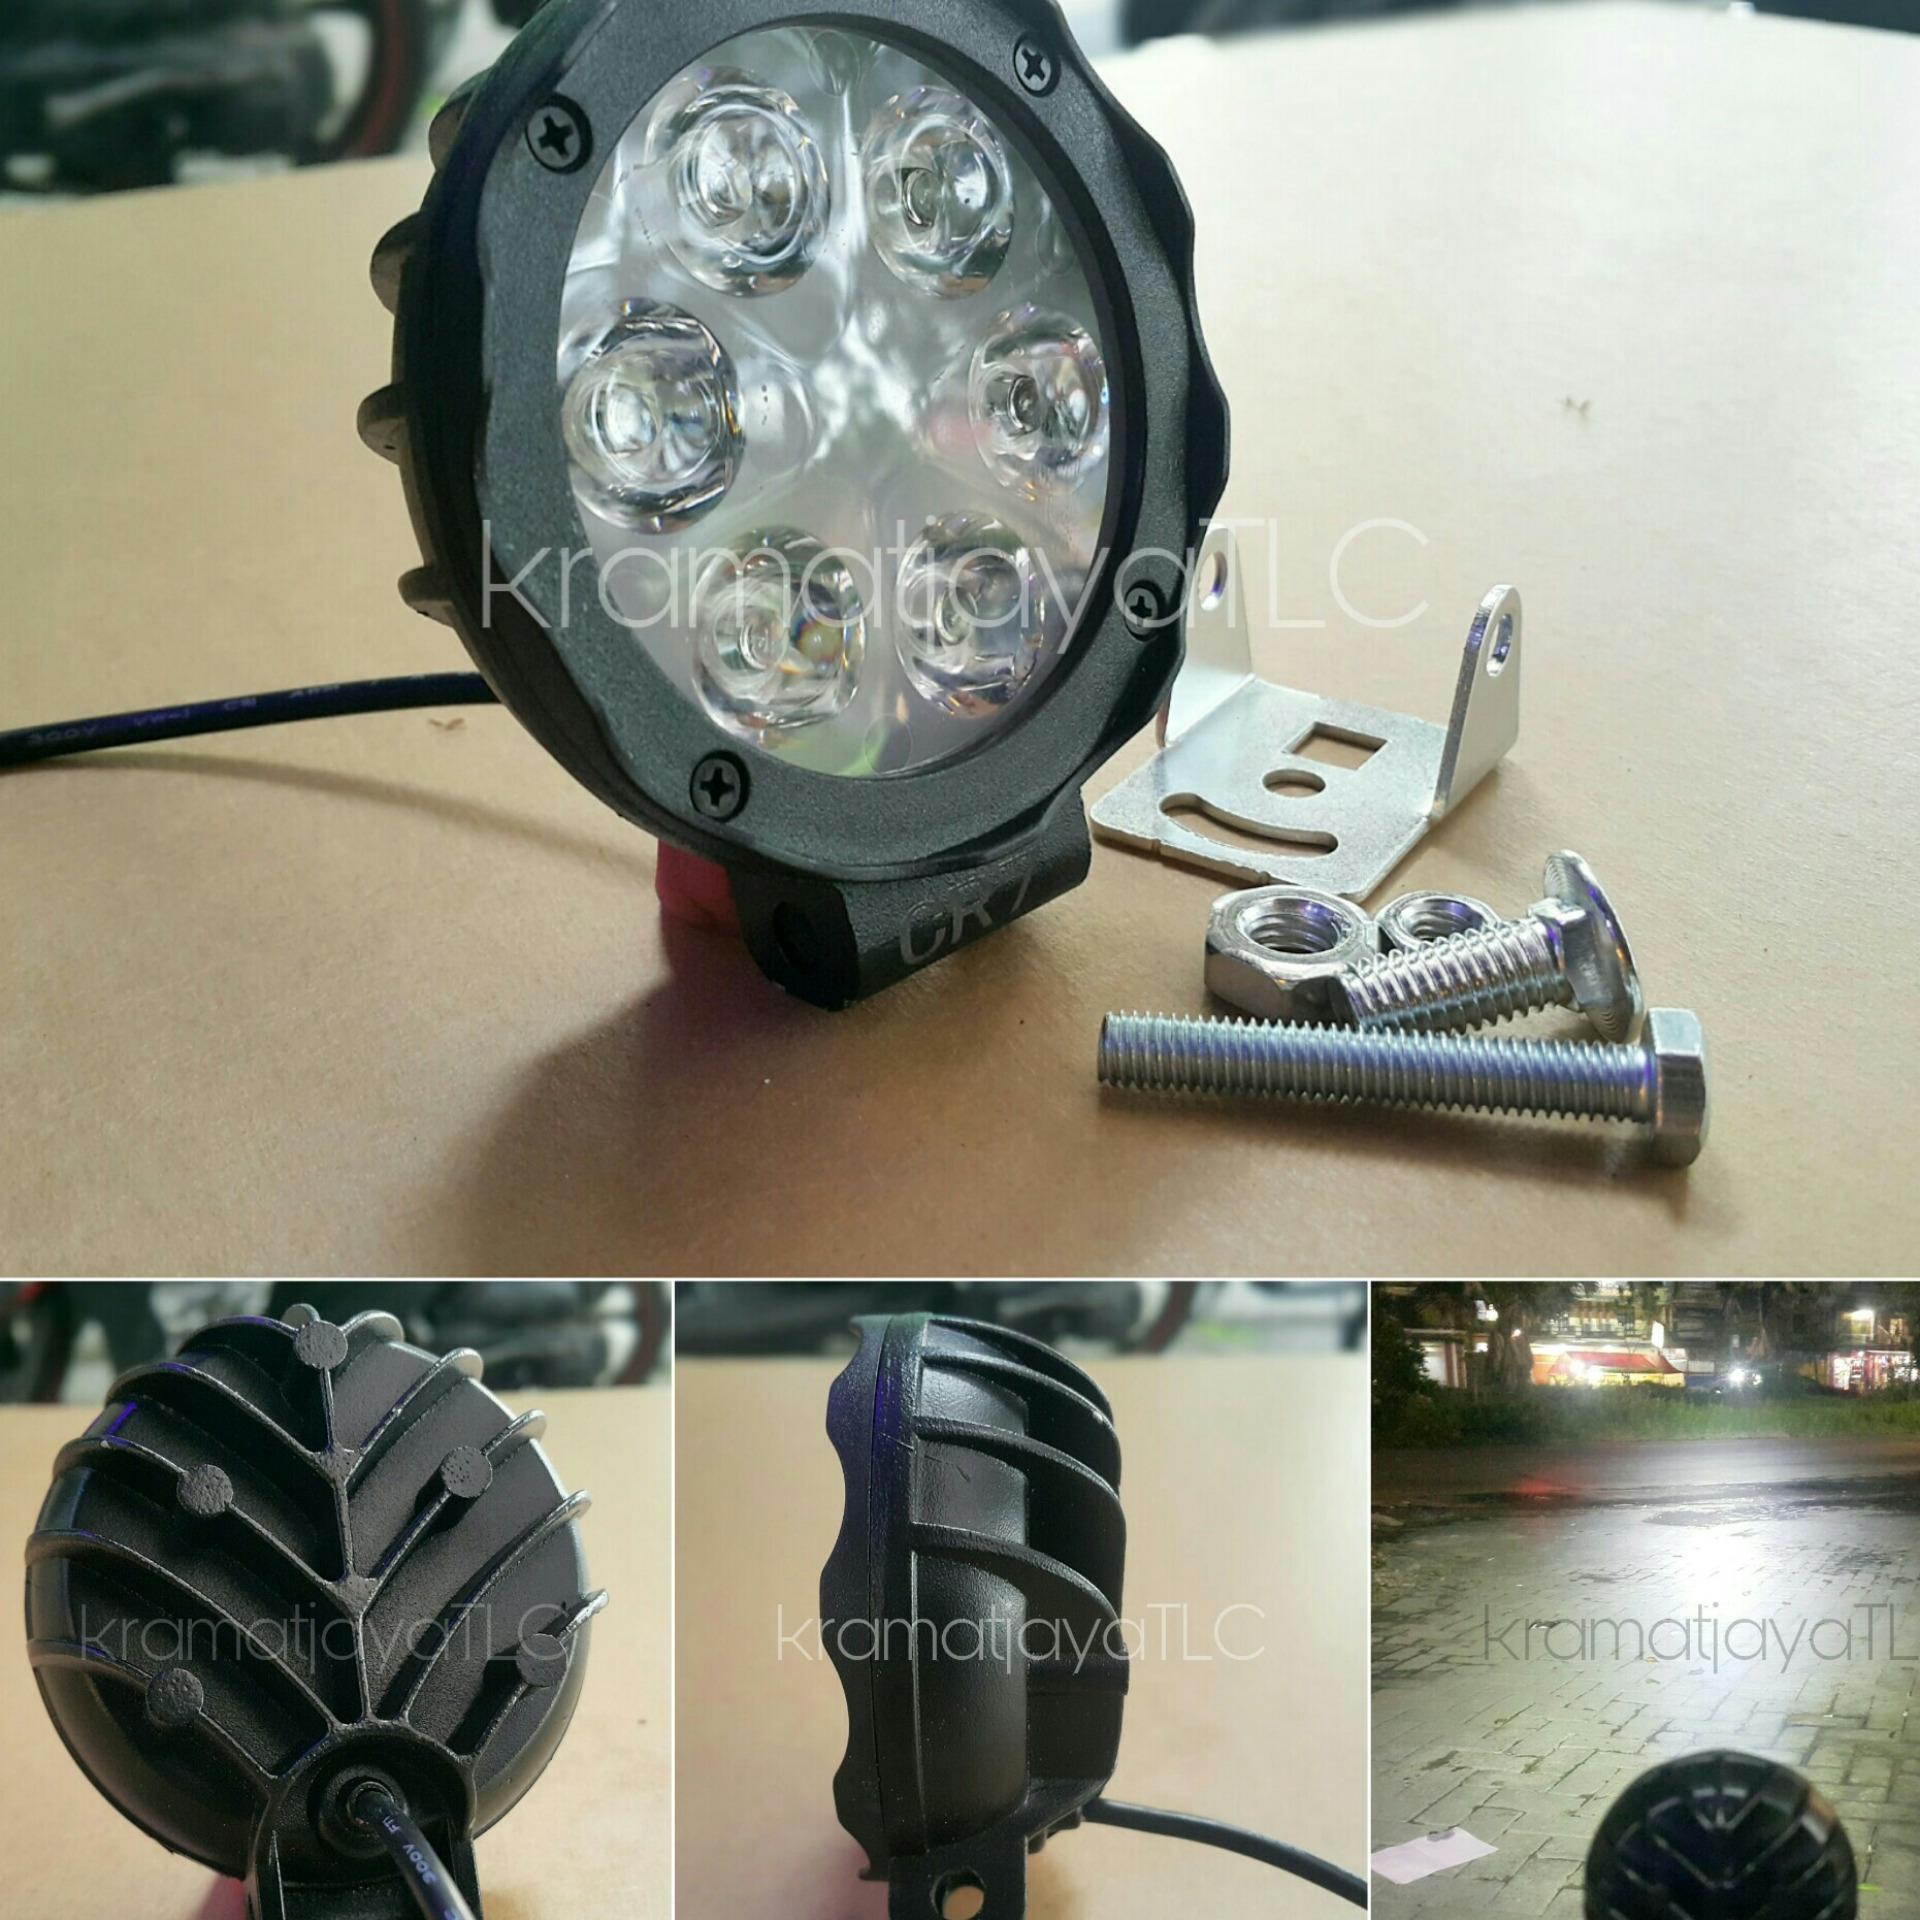 Daftar Harga Lampu Tembak Offroad Terbaru 2018 Led 27watt Bulat Koleksi November Paling Lengkap Sorot Cwl 6 Mata Mini